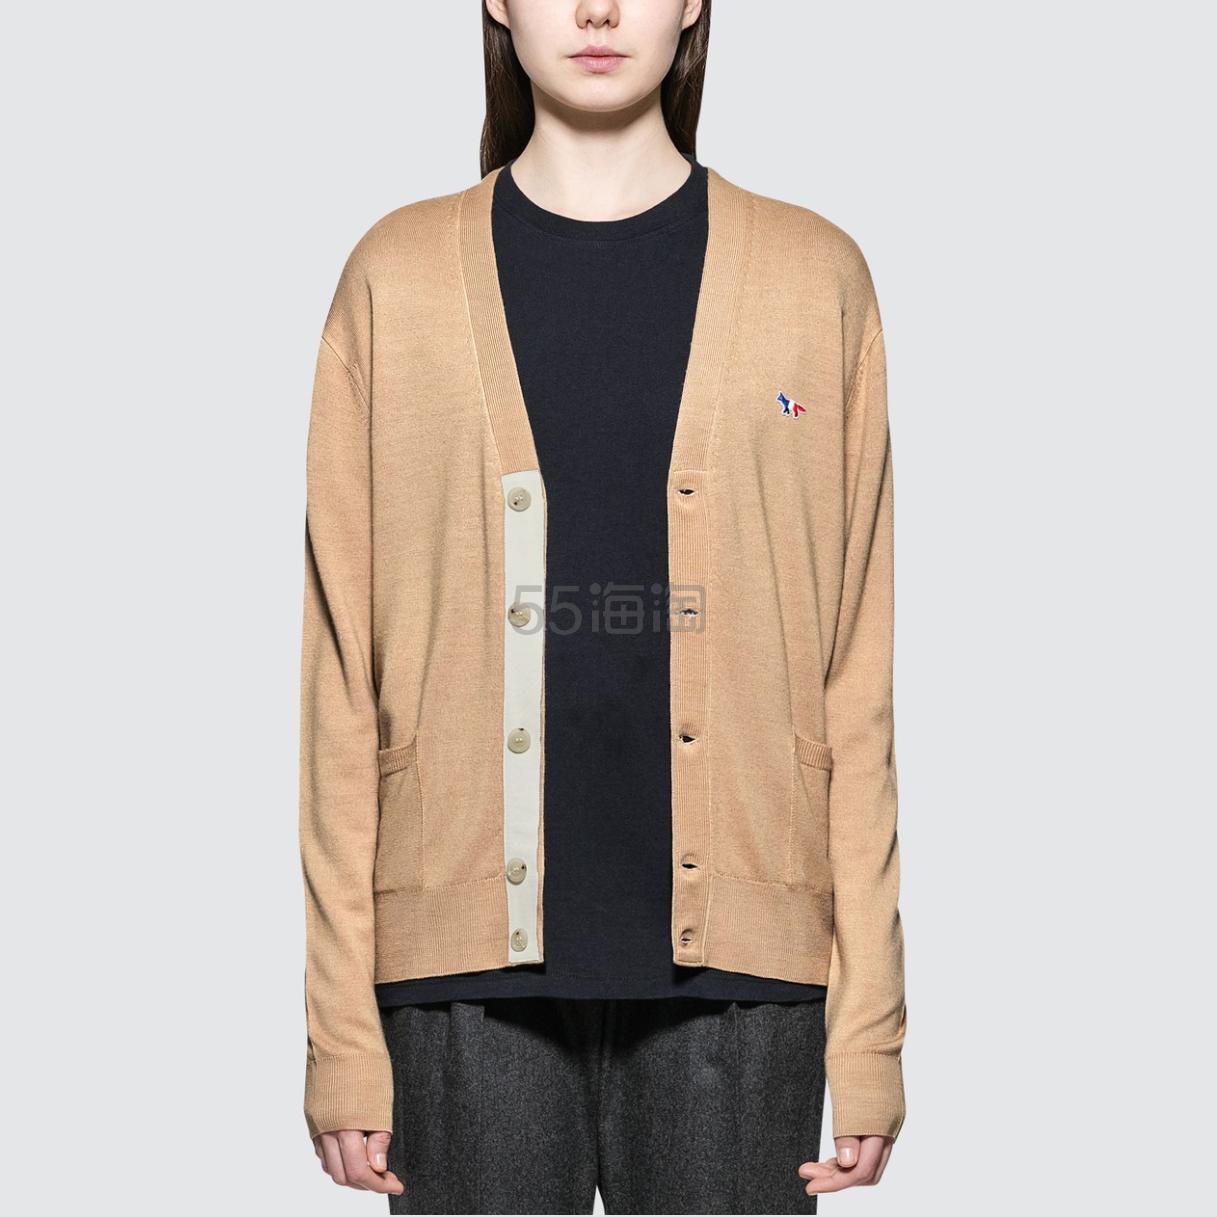 MAISON KITSUNE Tricolor Fox 开衫 6(约1,345元) - 海淘优惠海淘折扣|55海淘网